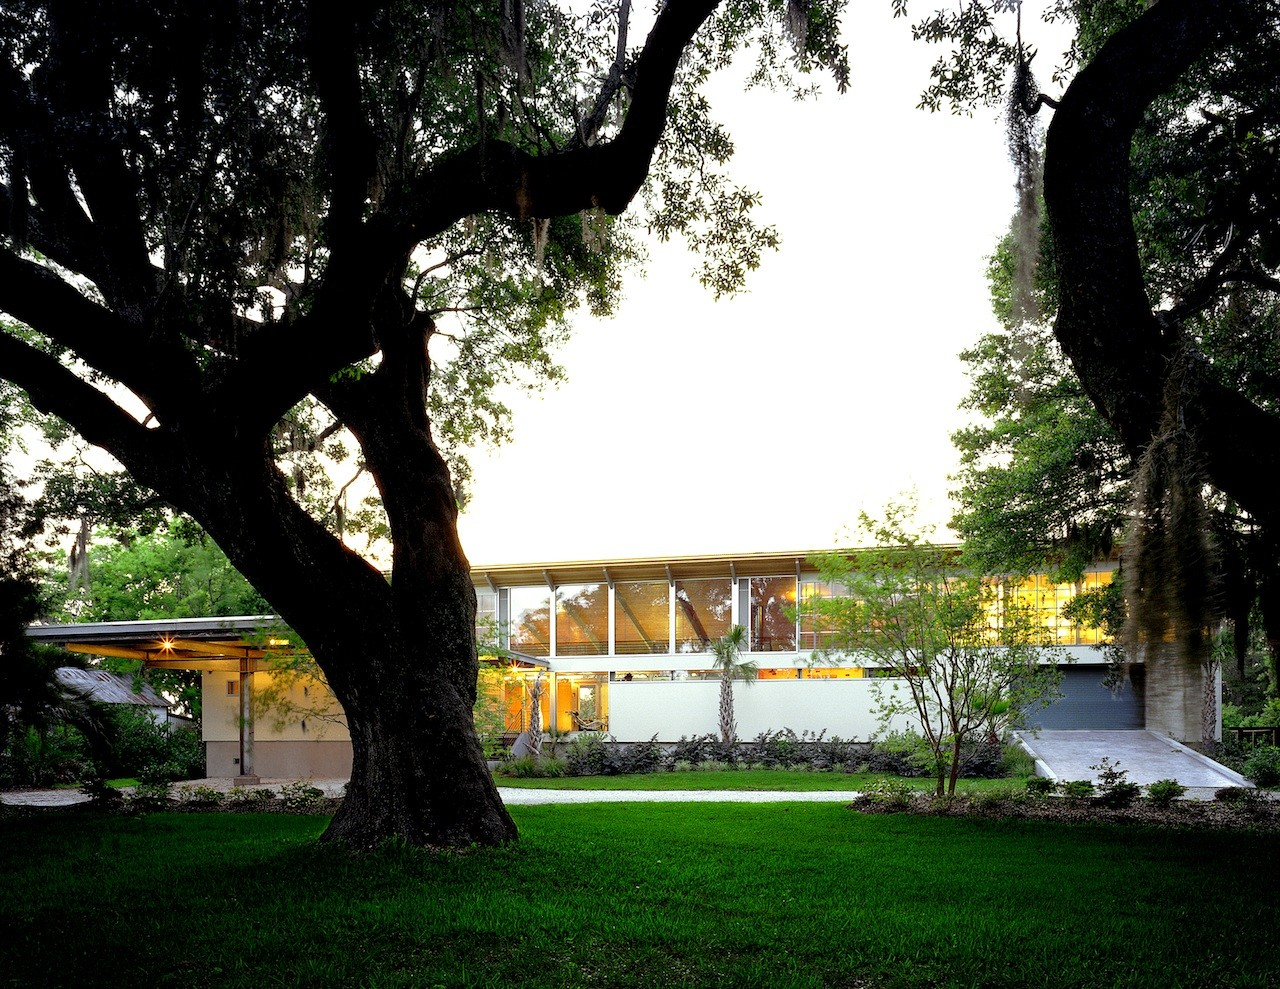 Residencia País Bajo / Frank Harmon Architect, © Richard Leo Johnson, Atlantic Archives, Inc.